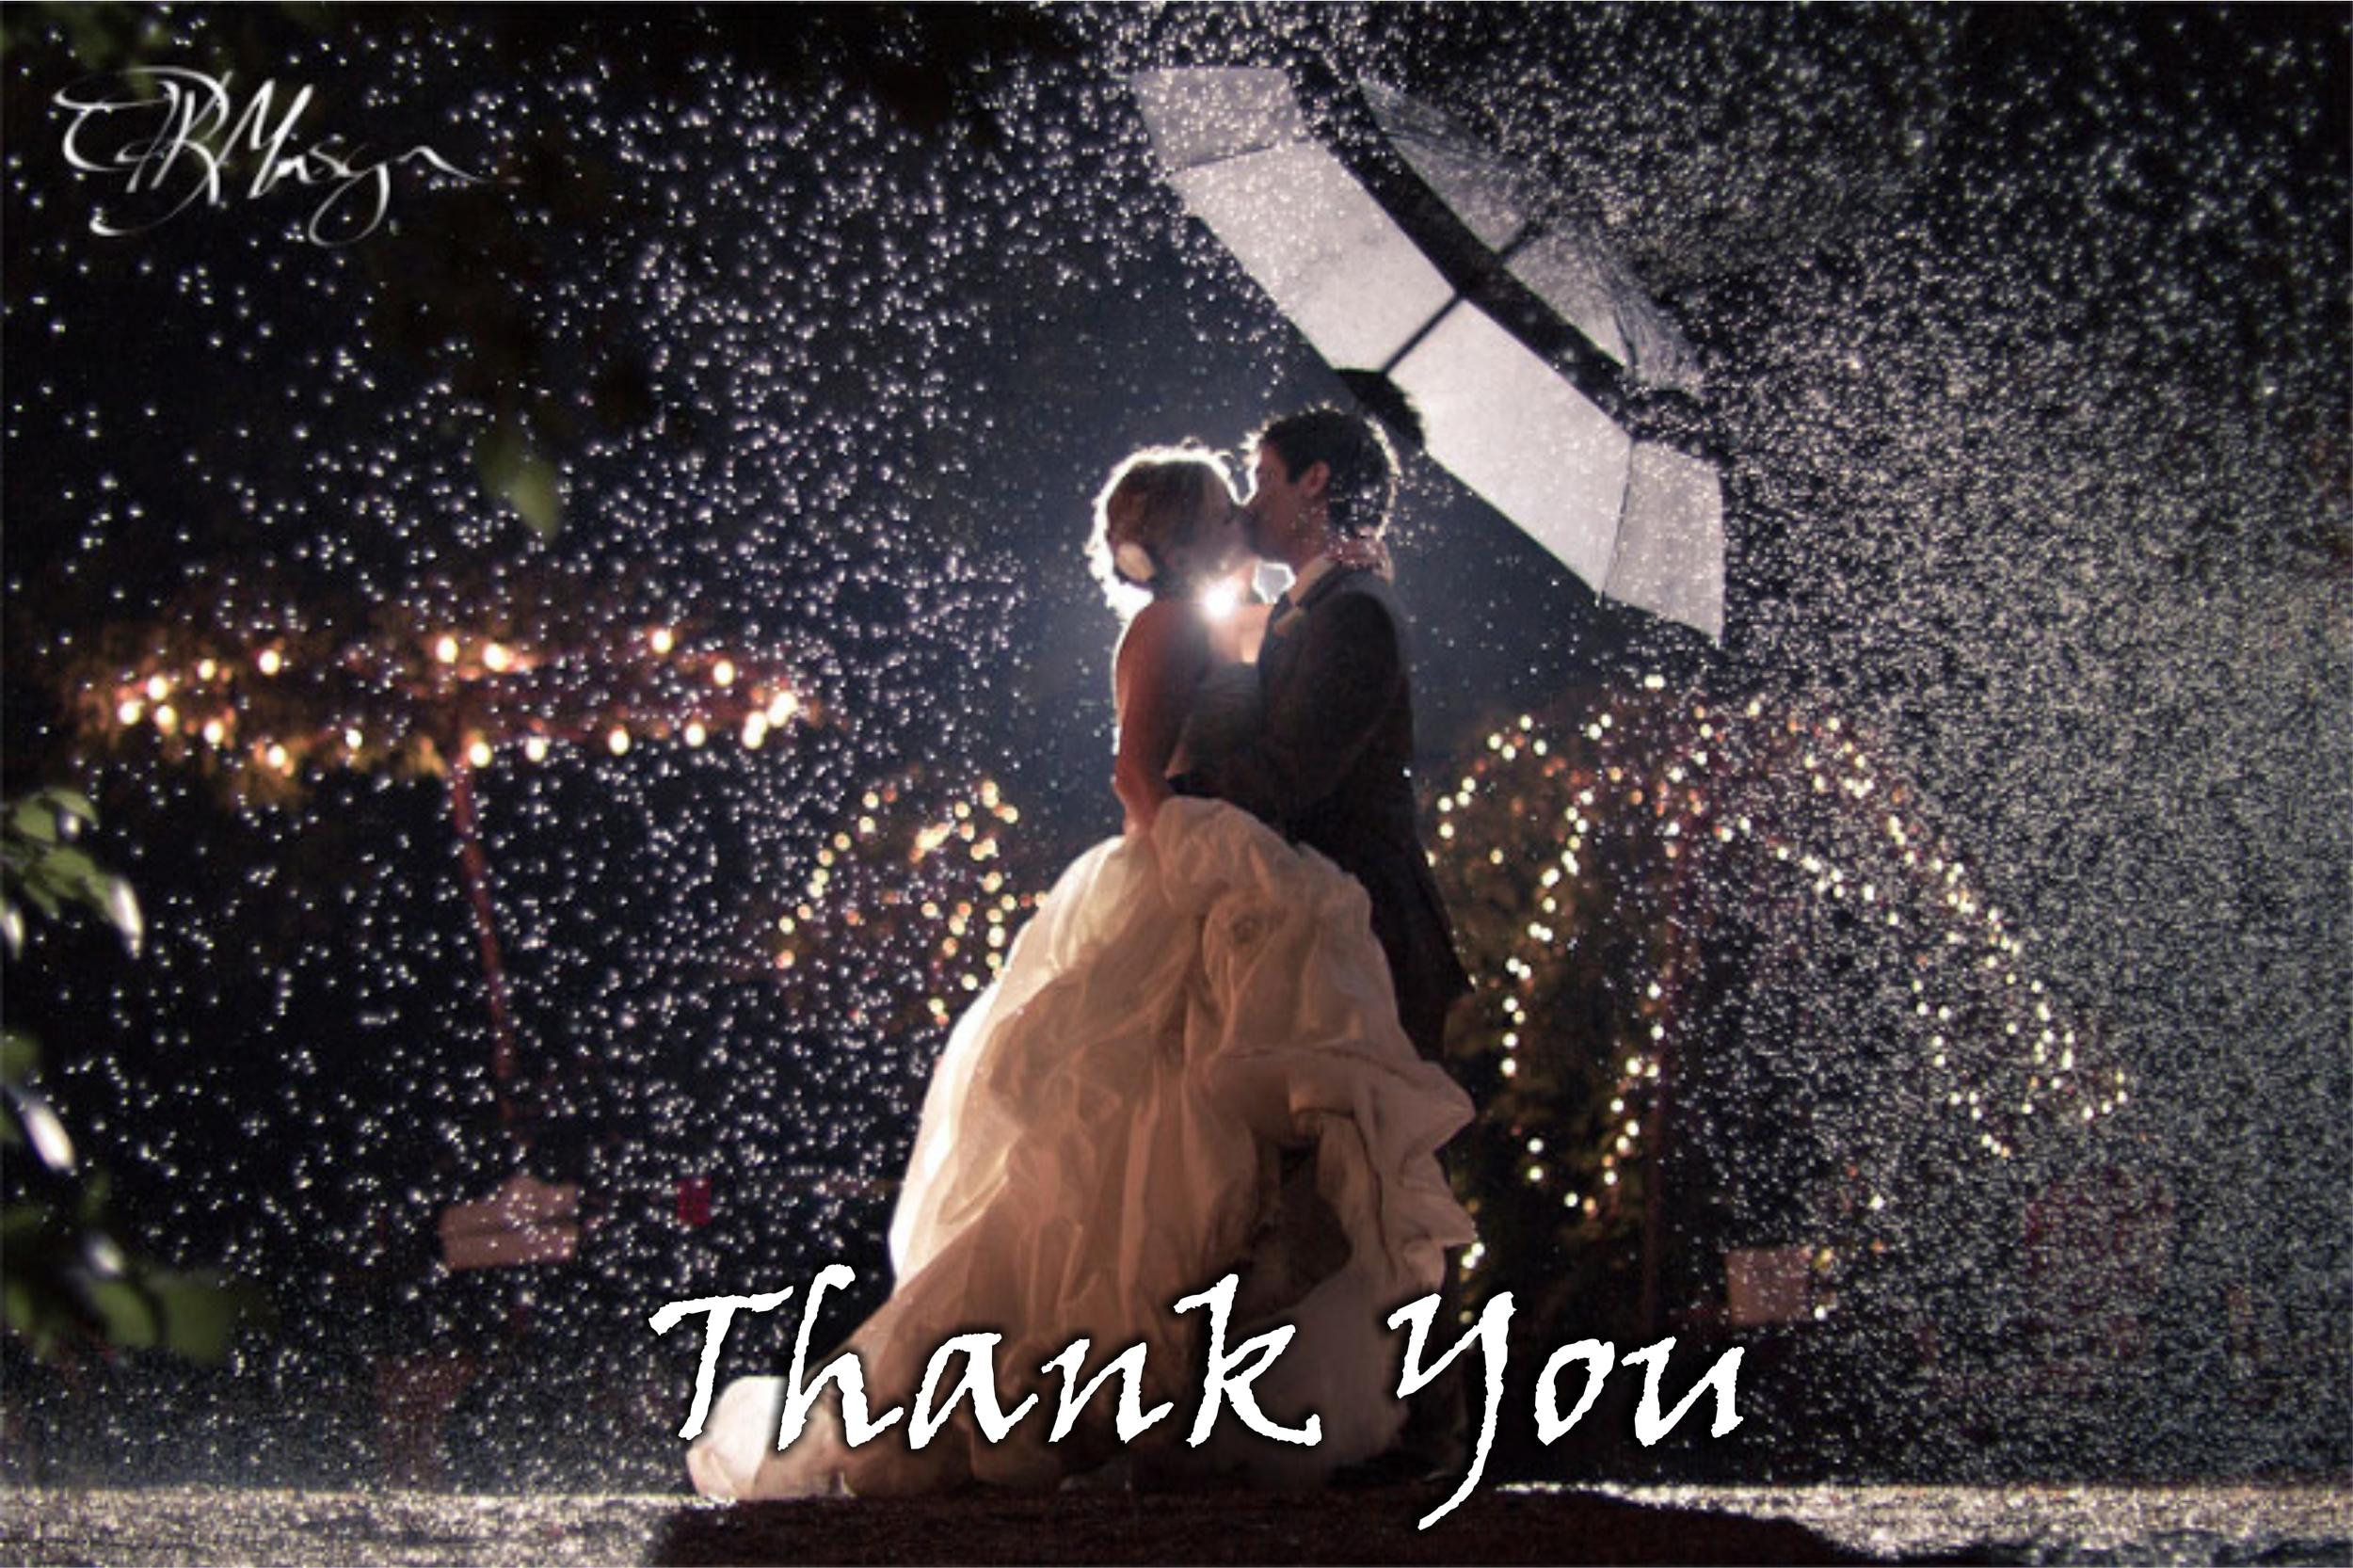 rain-thank you.jpg